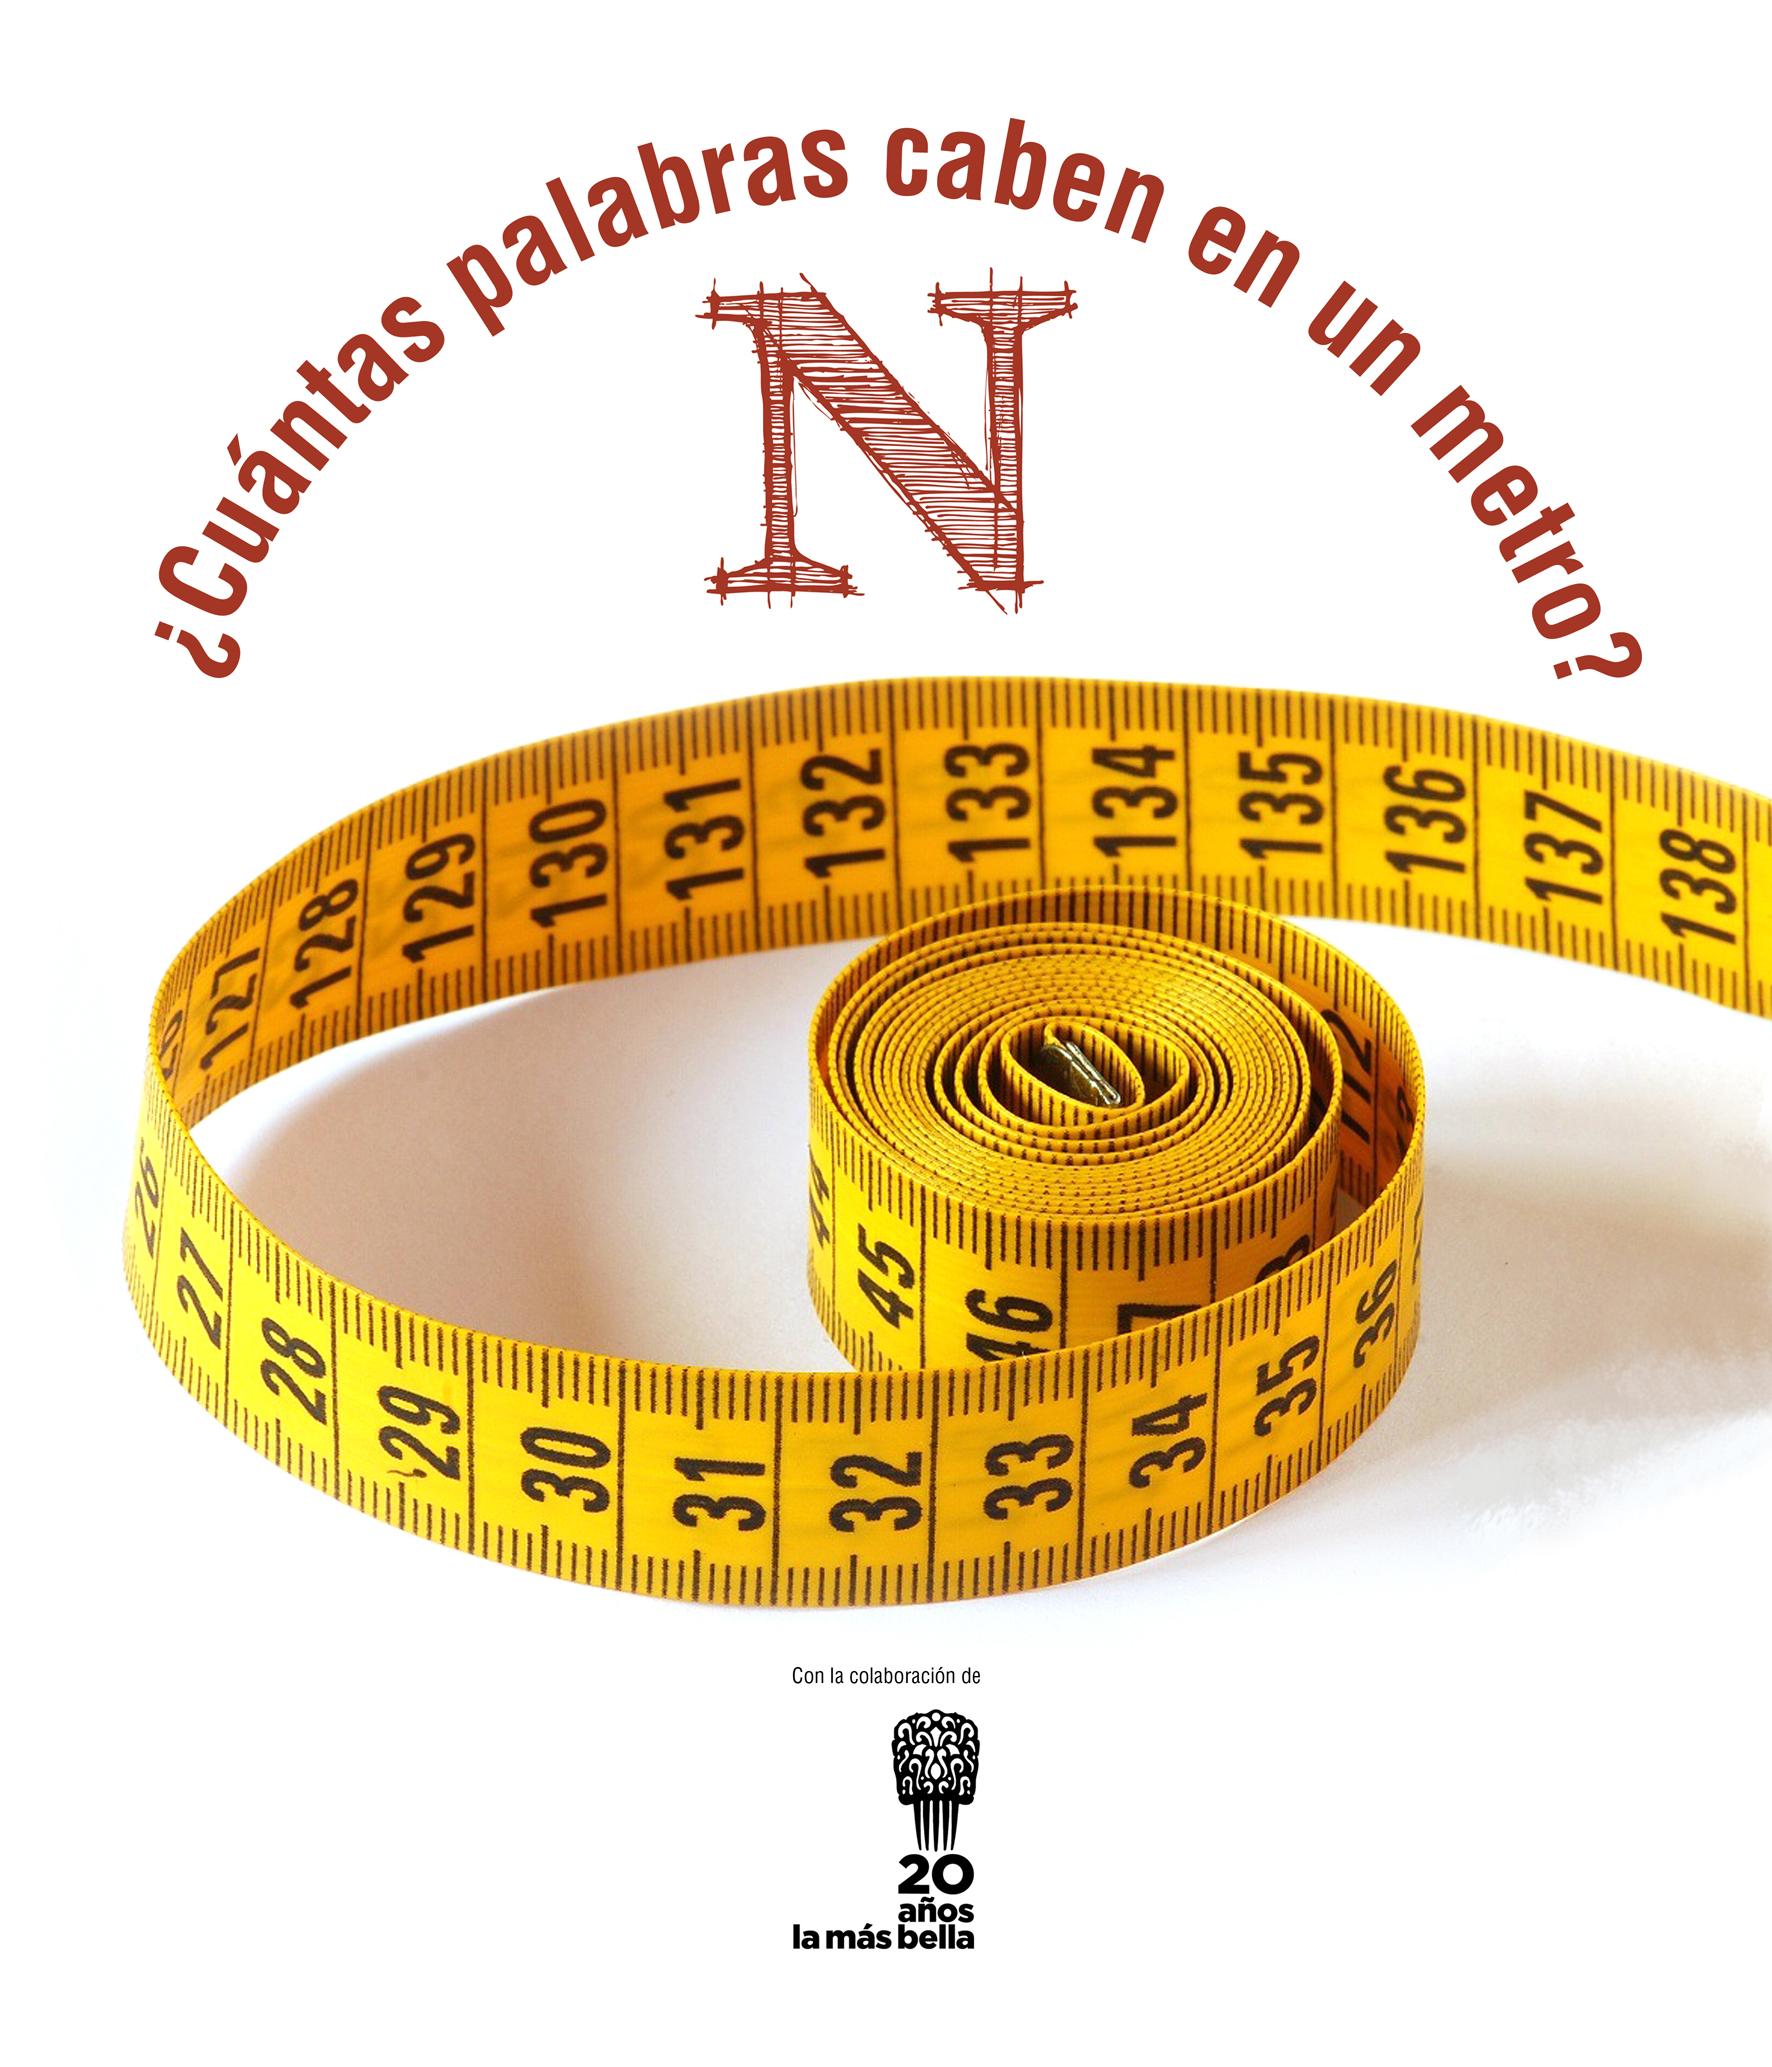 ¿Cuántas palabras caben en un metro? - Cartel para BolaBellamátic